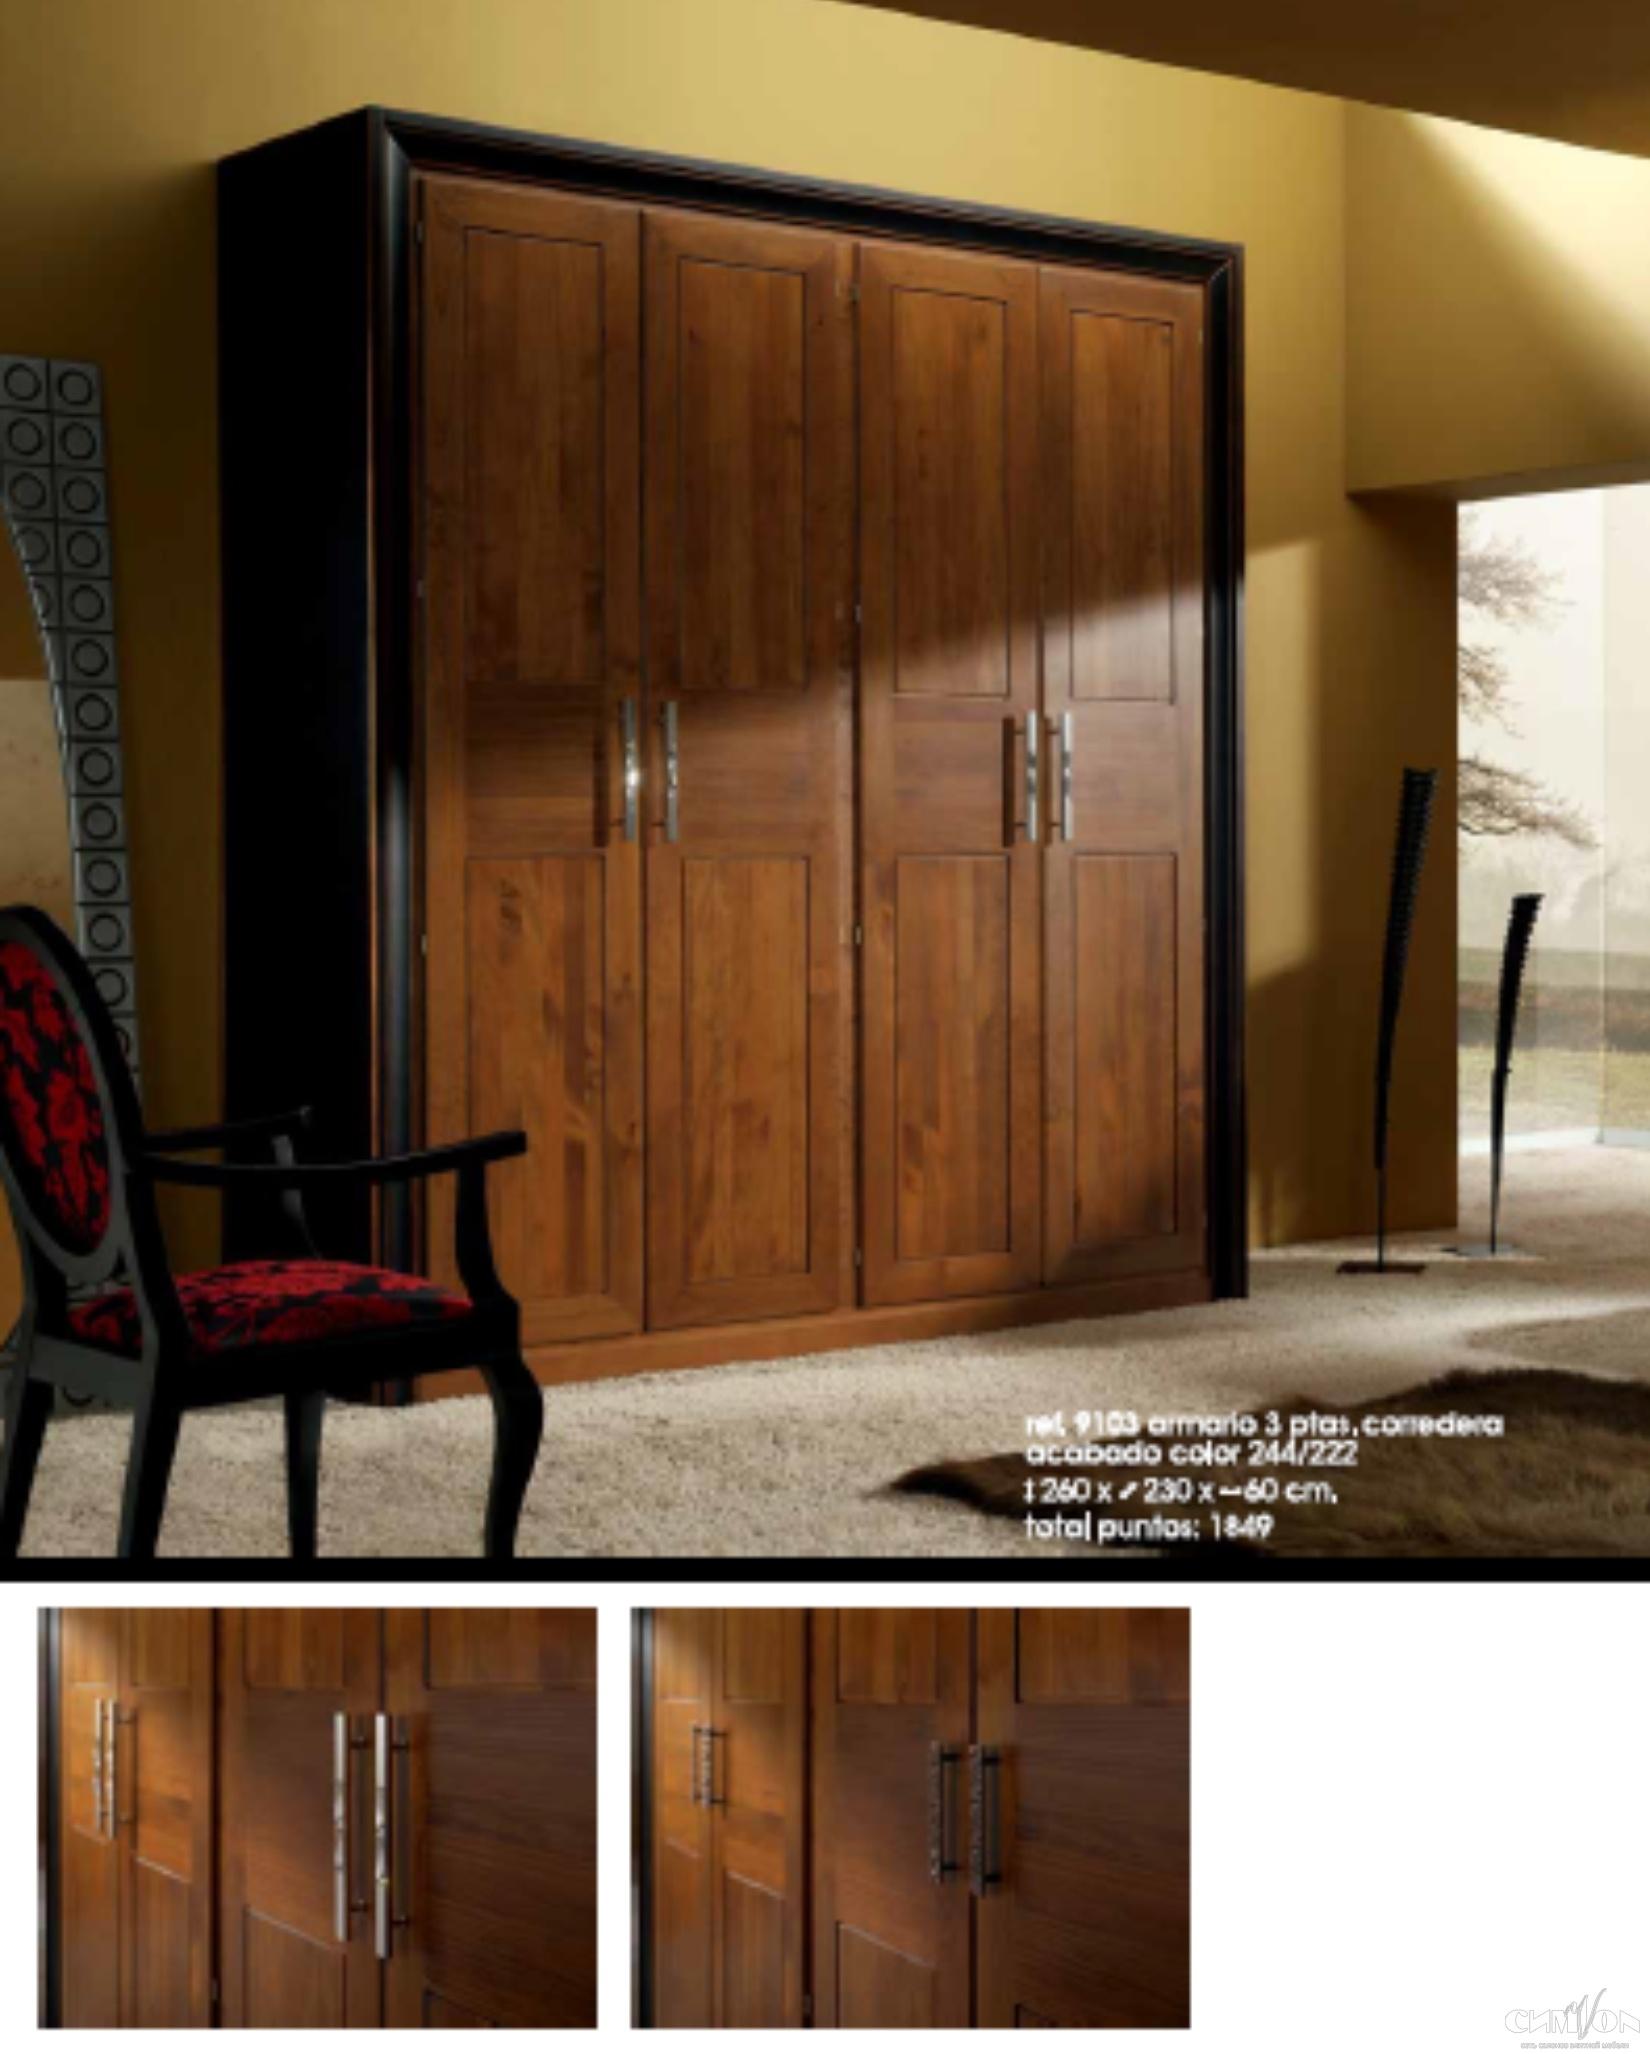 Мебель :: шкафы и стенки :: шкафы :: шкафы с распашными двер.